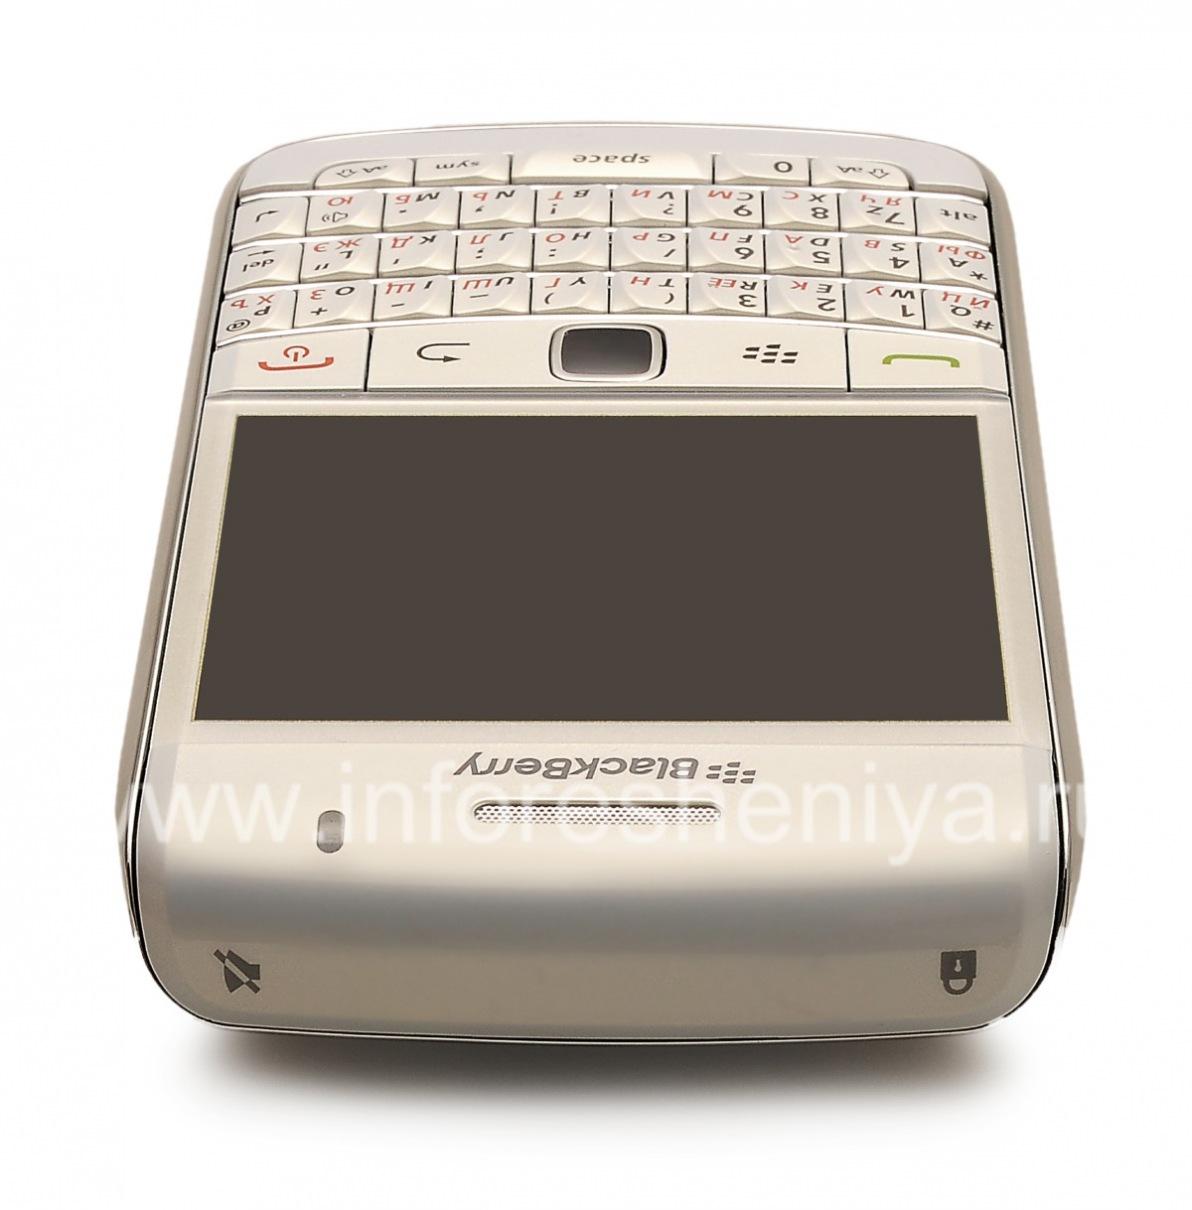 ... Photo 6 — Smartphone BlackBerry 9700 Bold, Pearl White ...